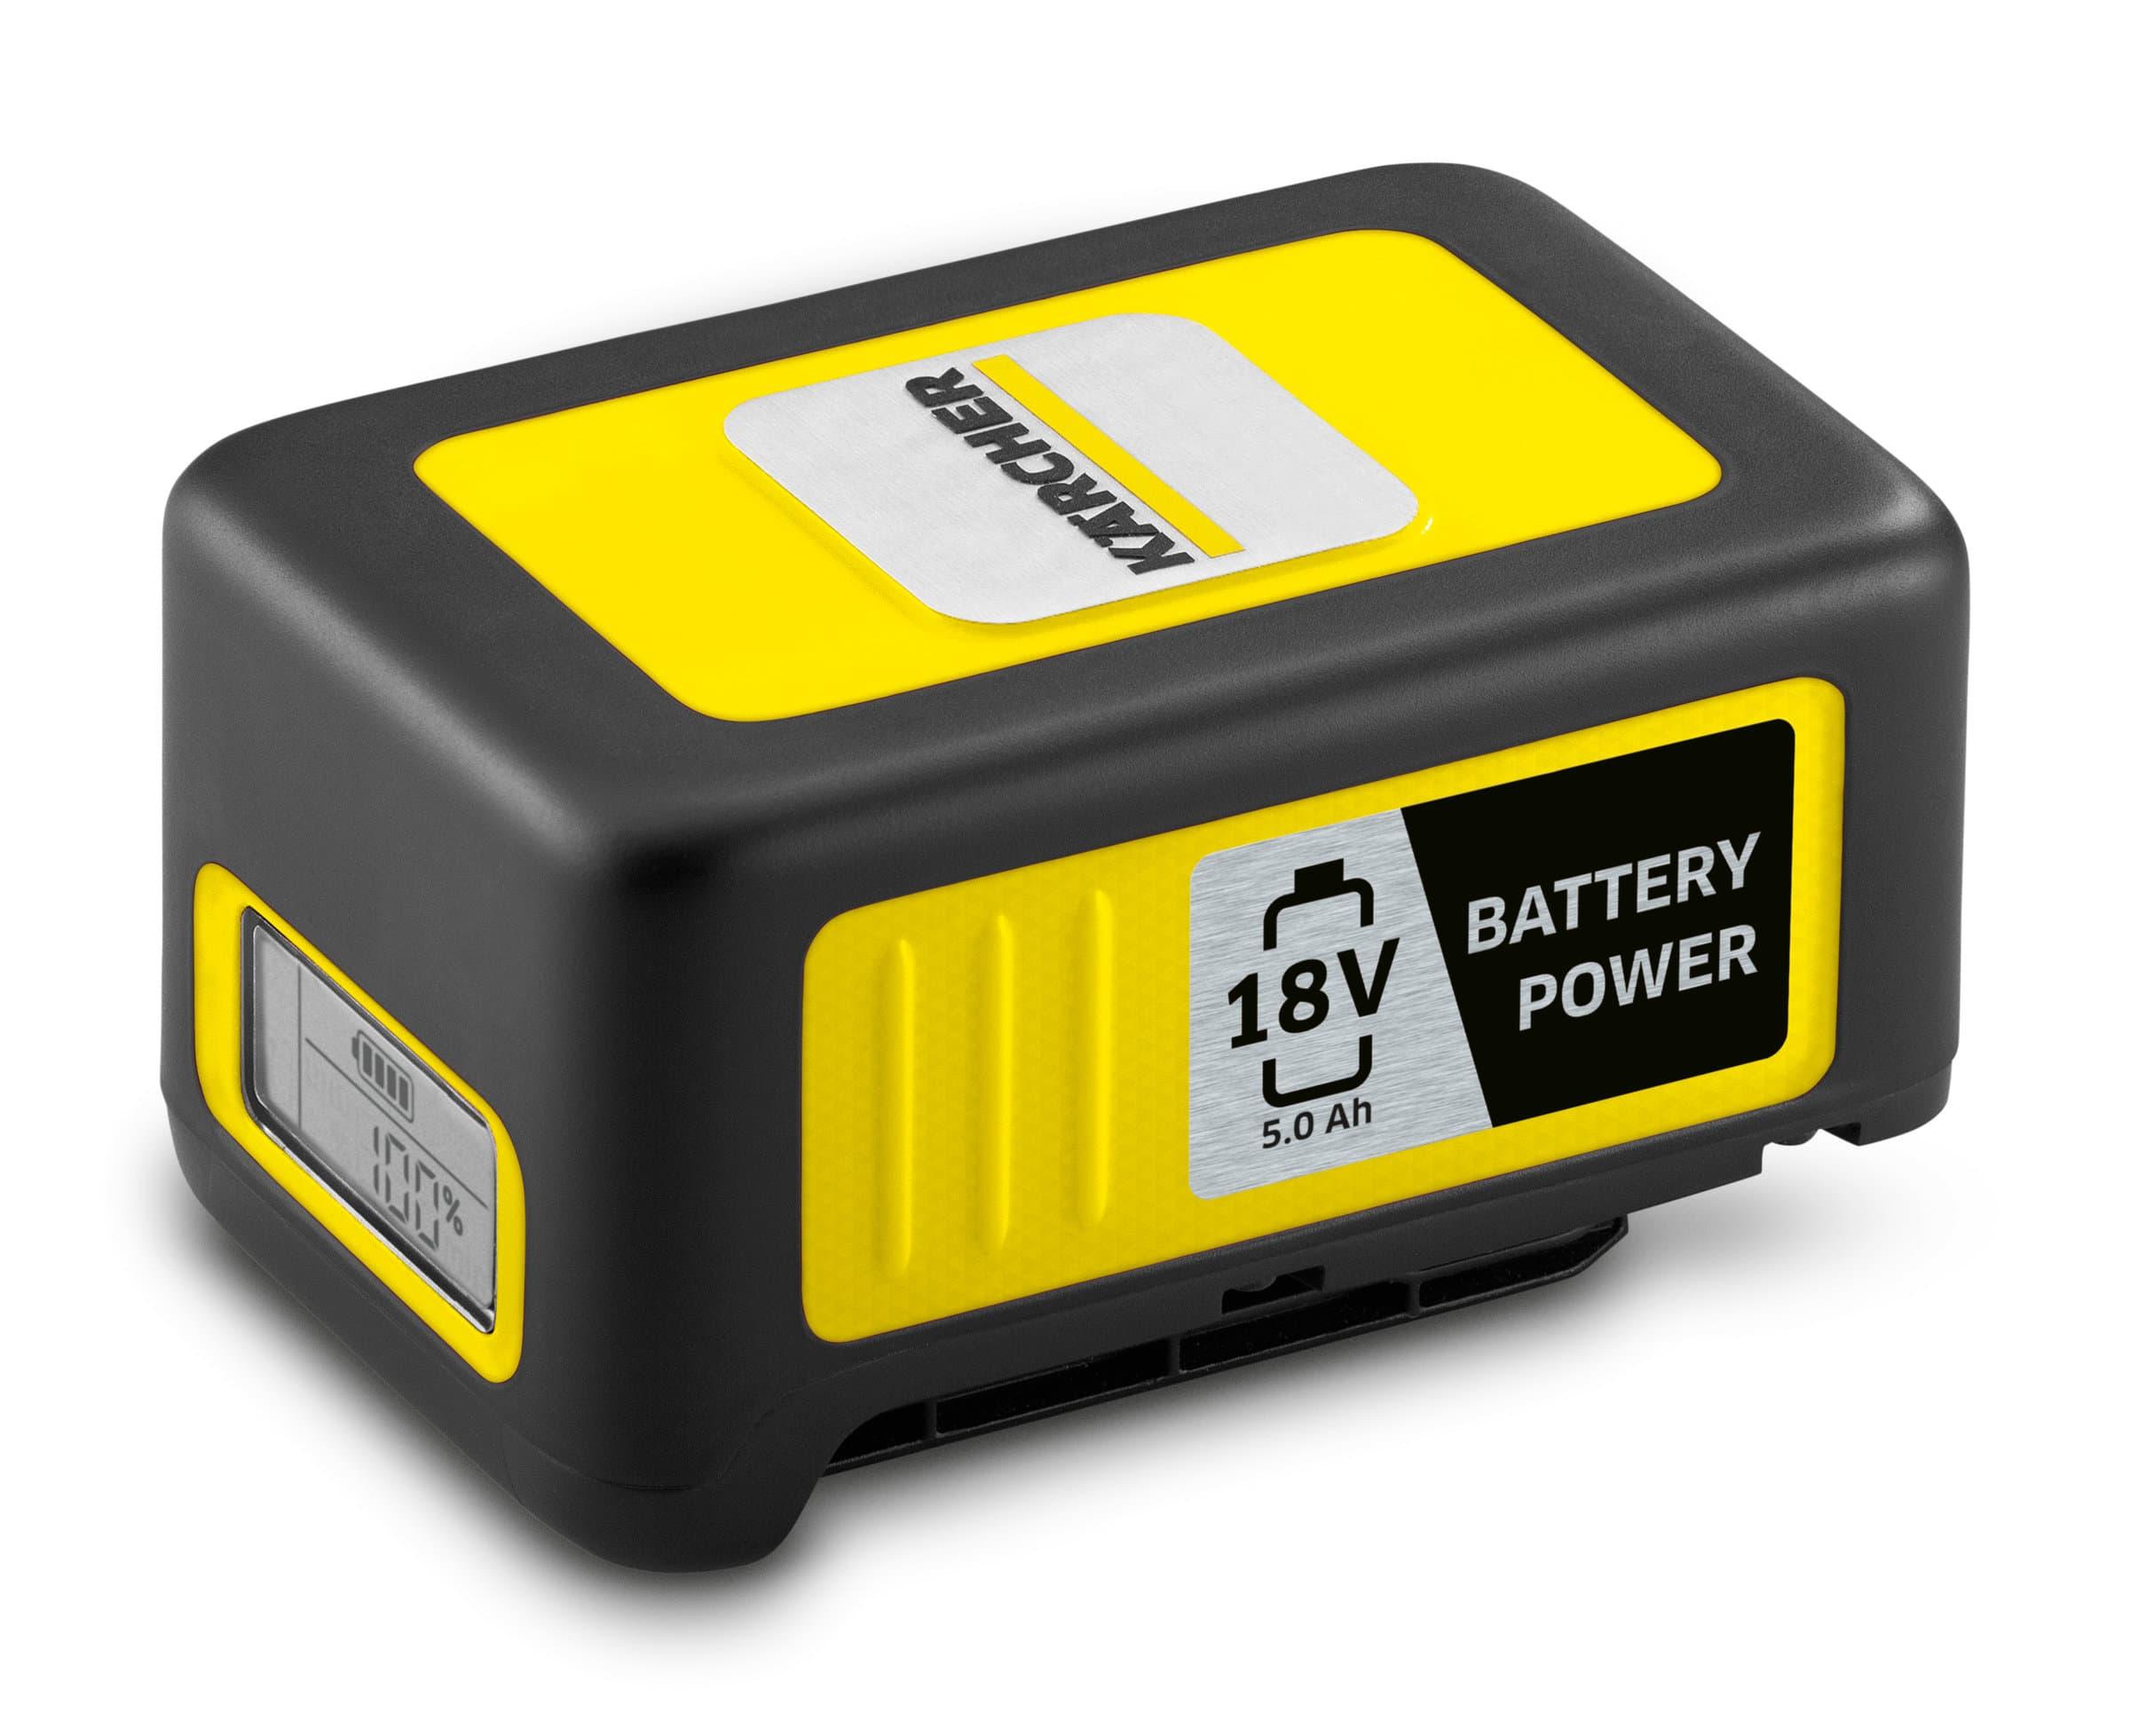 Kärcher Battery Power 18/50 Batterie de rechange